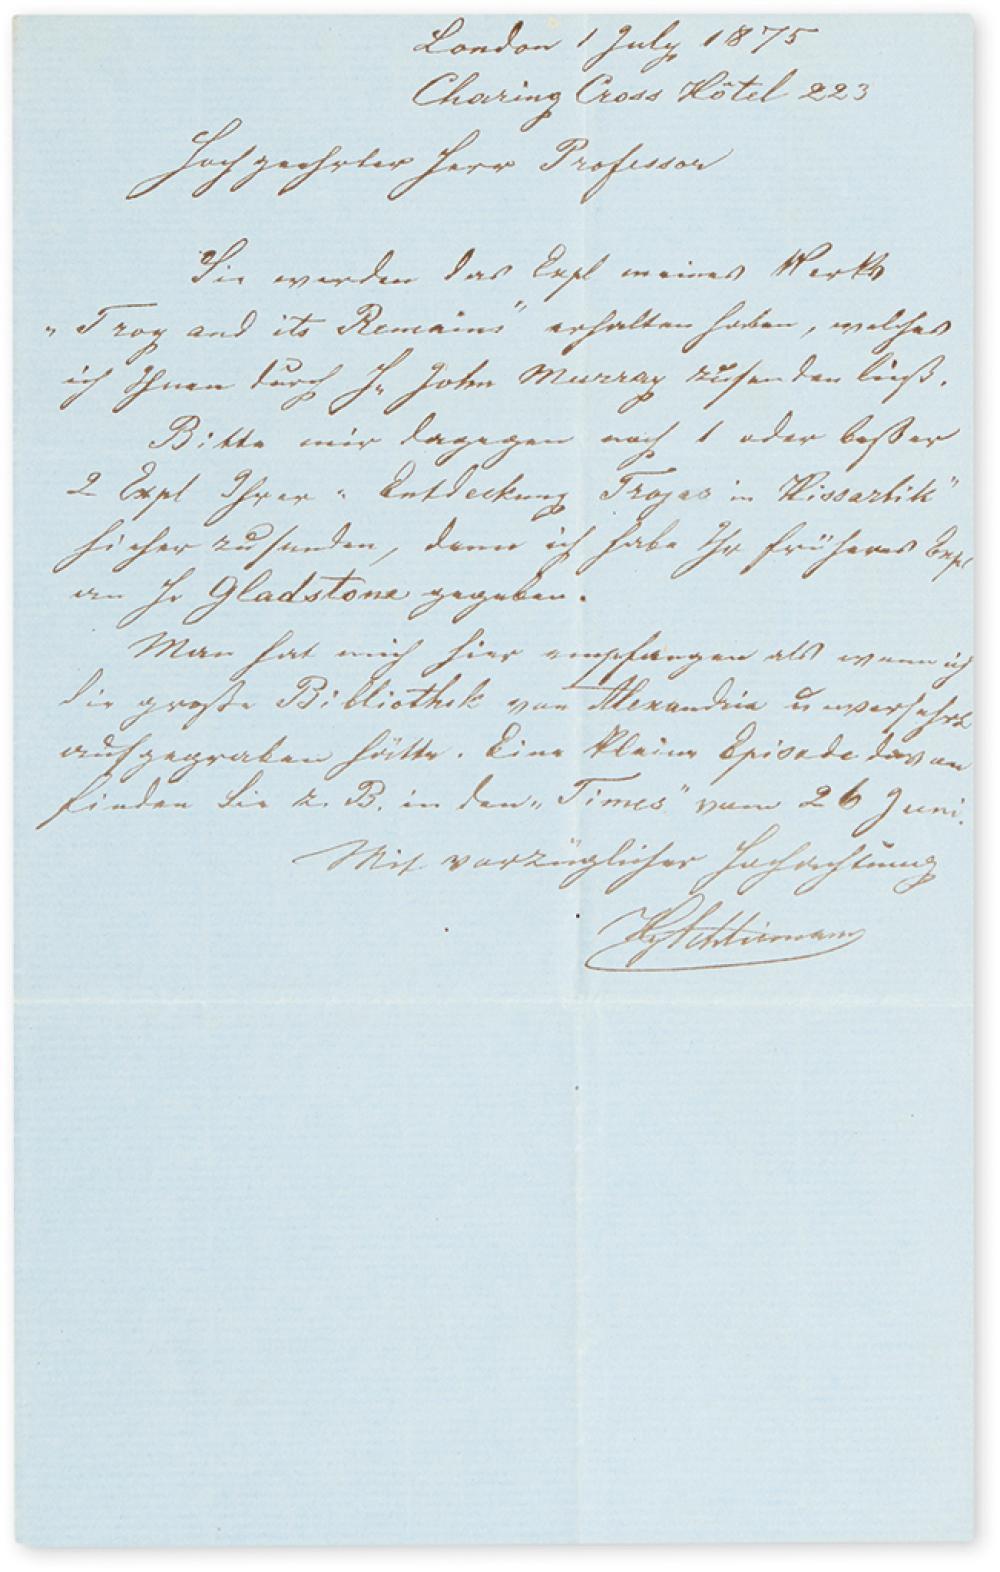 SCHLIEMANN, HEINRICH. Autograph Letter Signed,